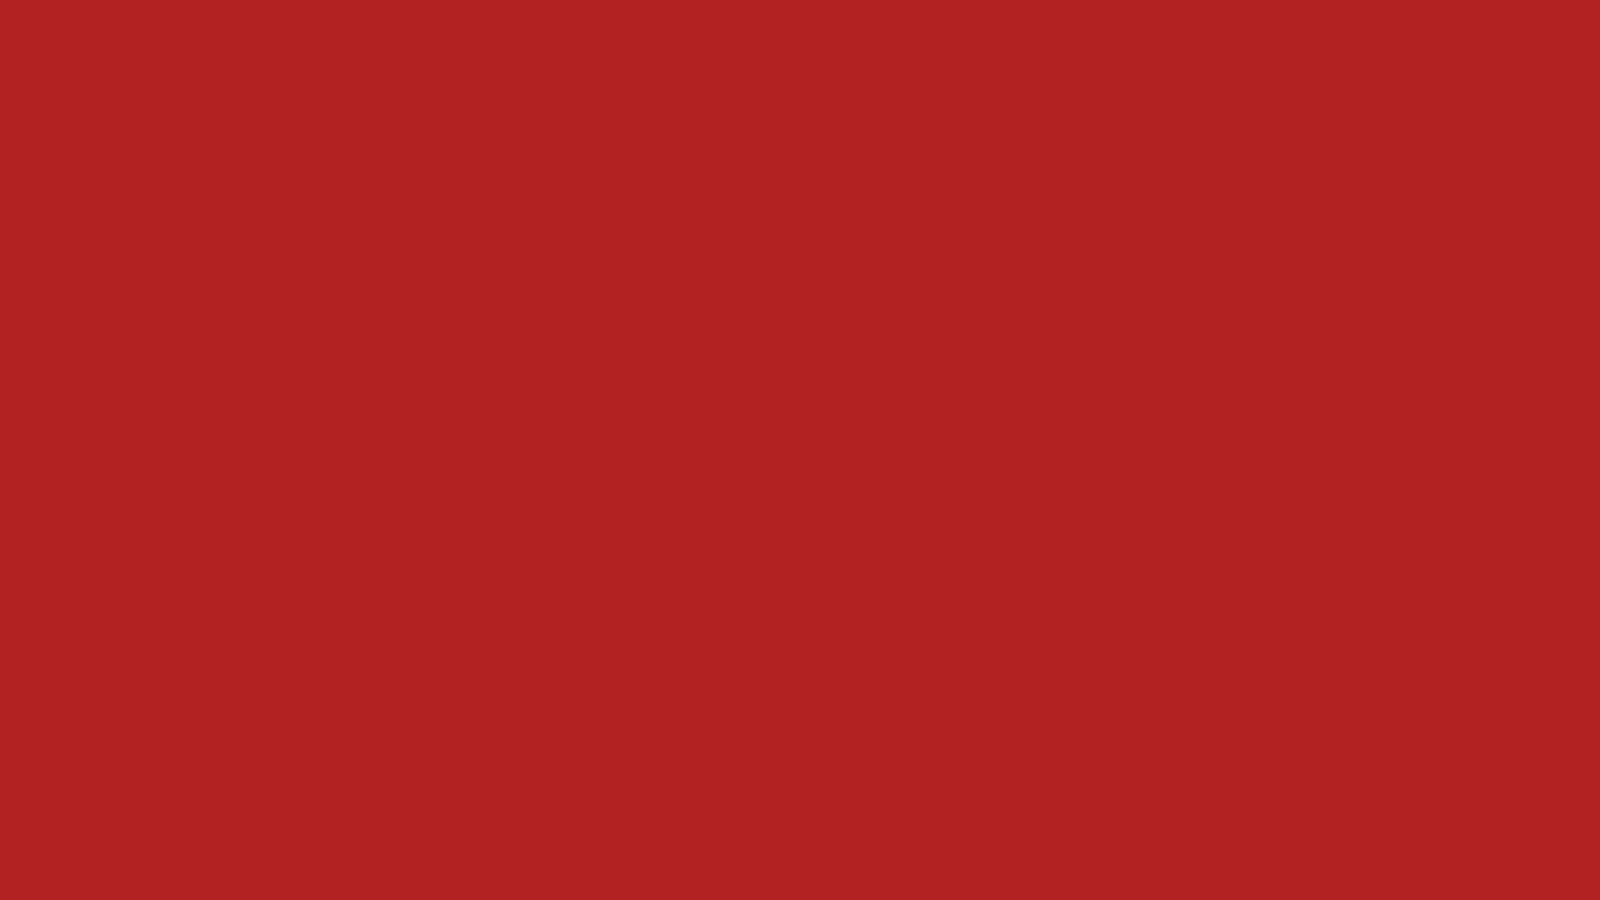 1600x900 Firebrick Solid Color Background